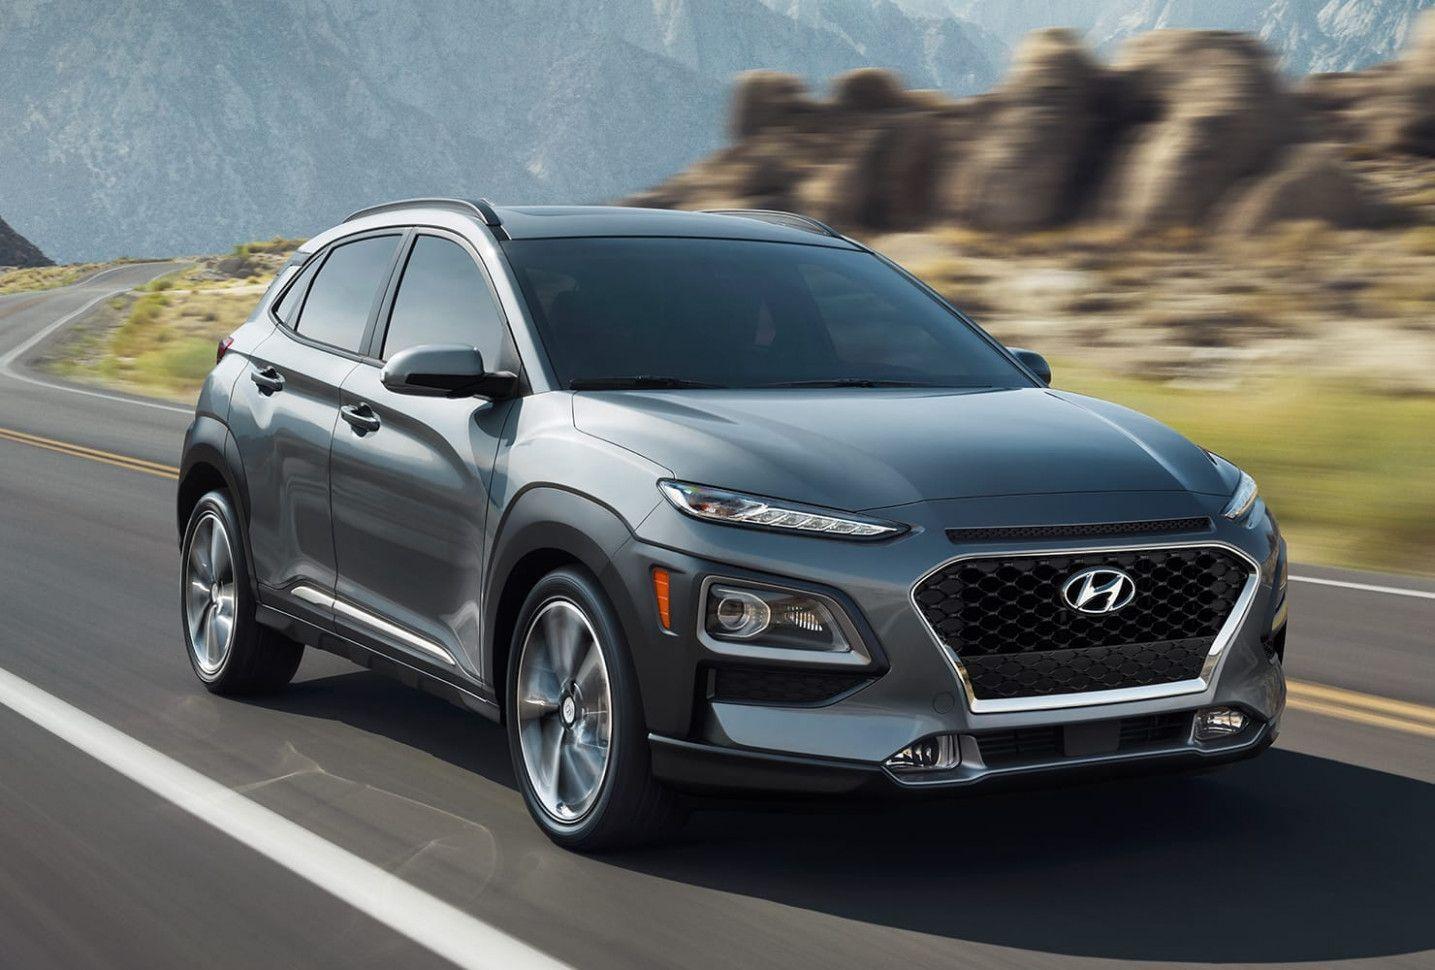 2020 Hyundai Suv Lineup History en 2020